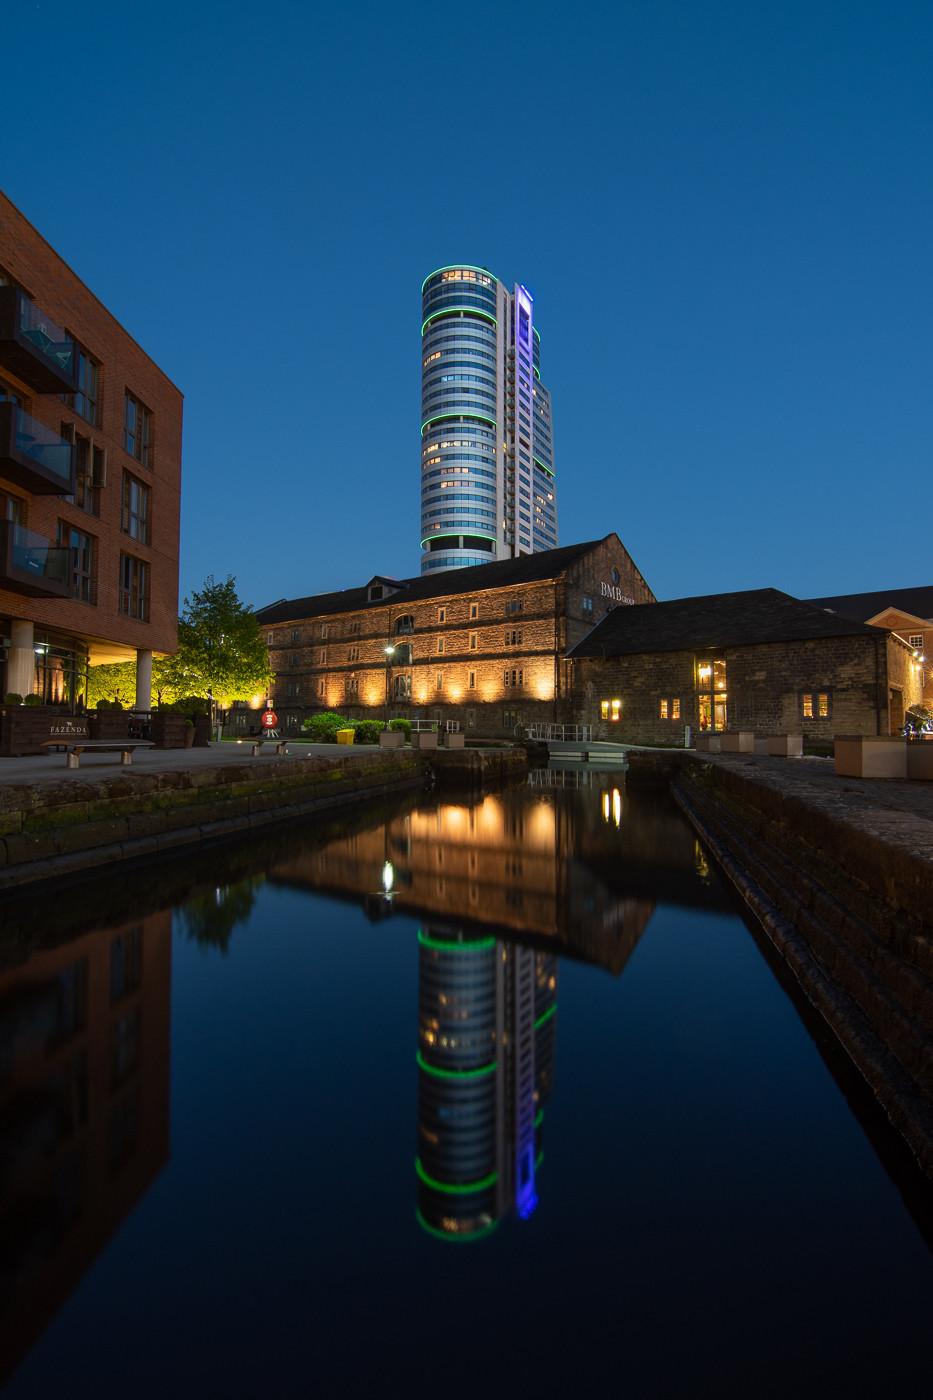 cityscape, bridgewater place, granary wharf, urban nightscape